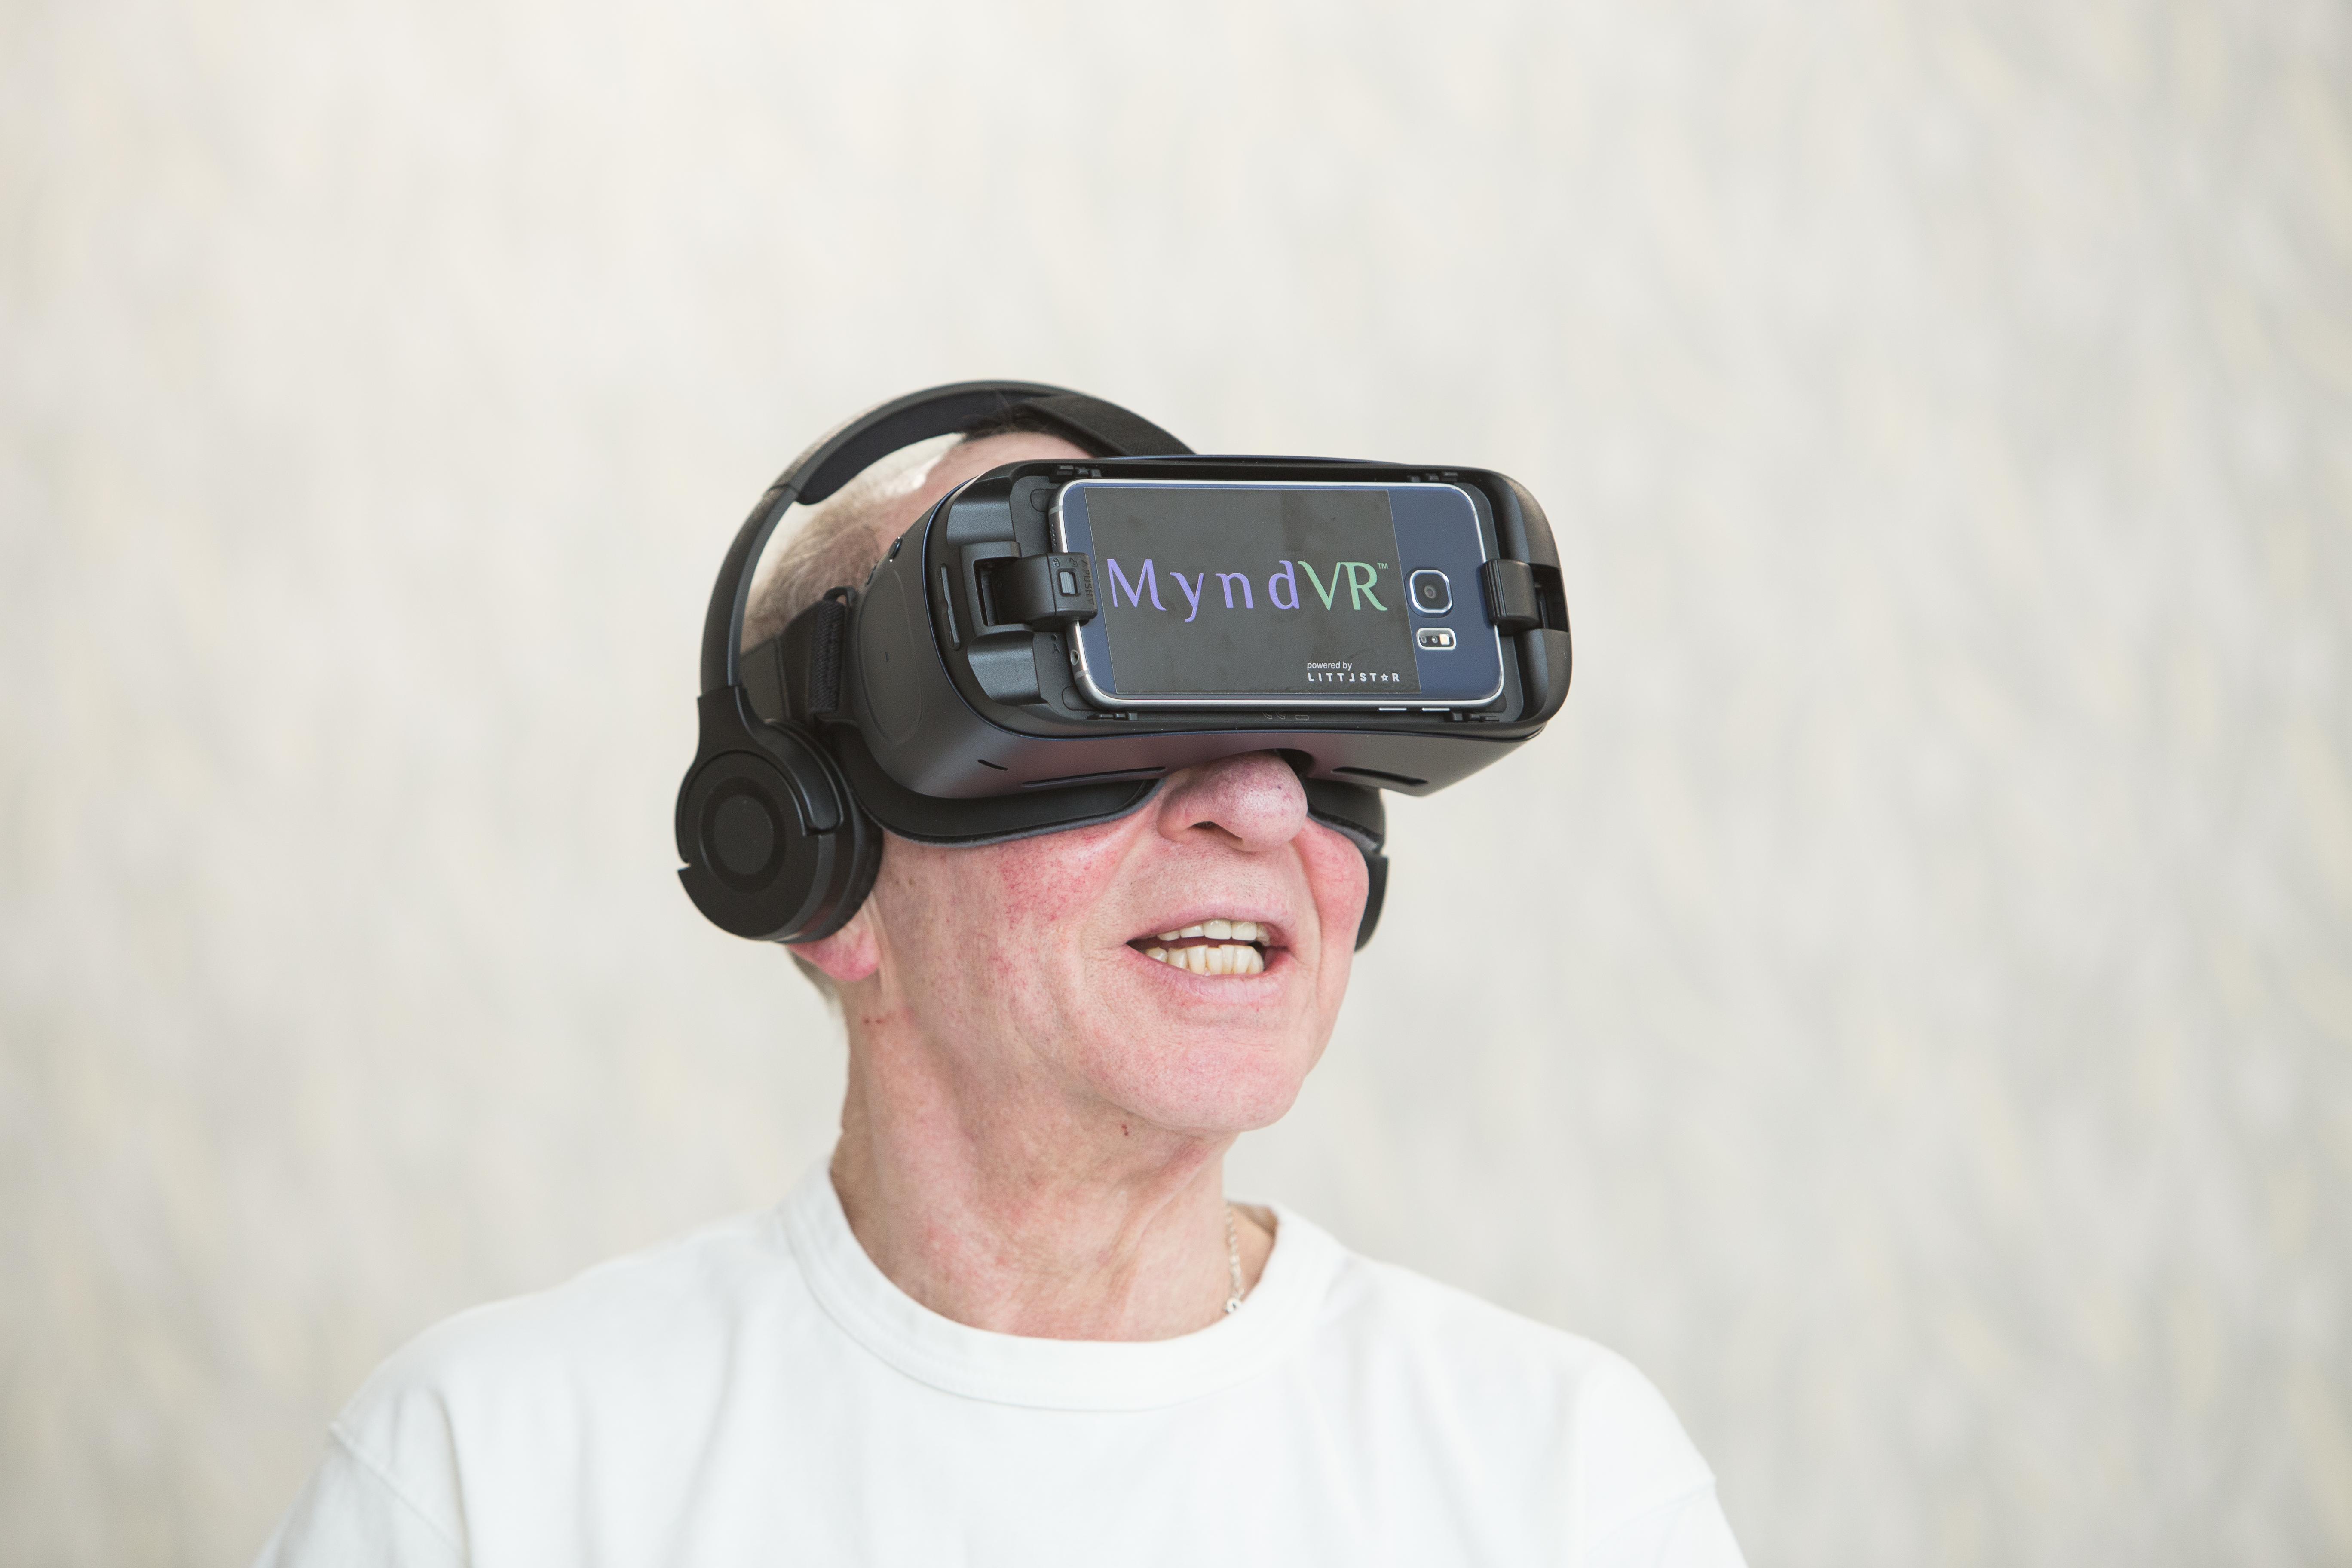 MyndVR at Upper East Side : A Future for Cognitive Health